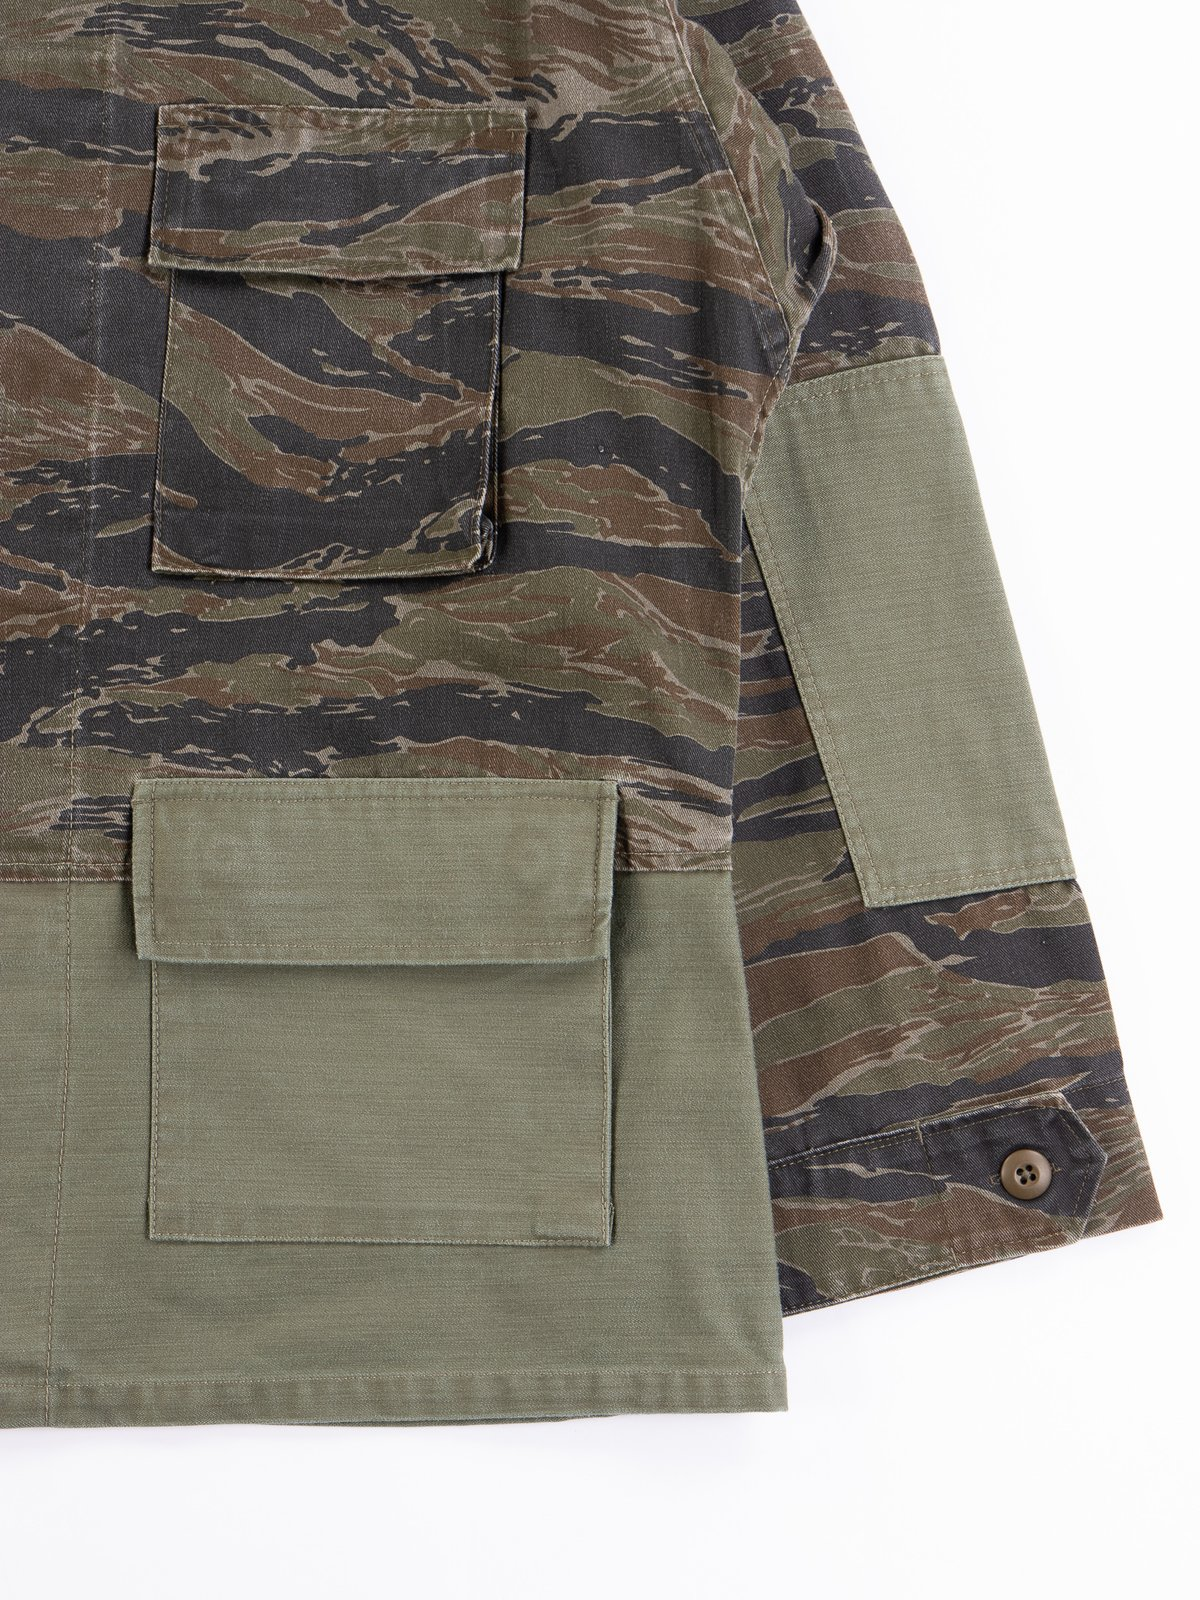 Reworks Camo/Olive Field Jacket - Image 3